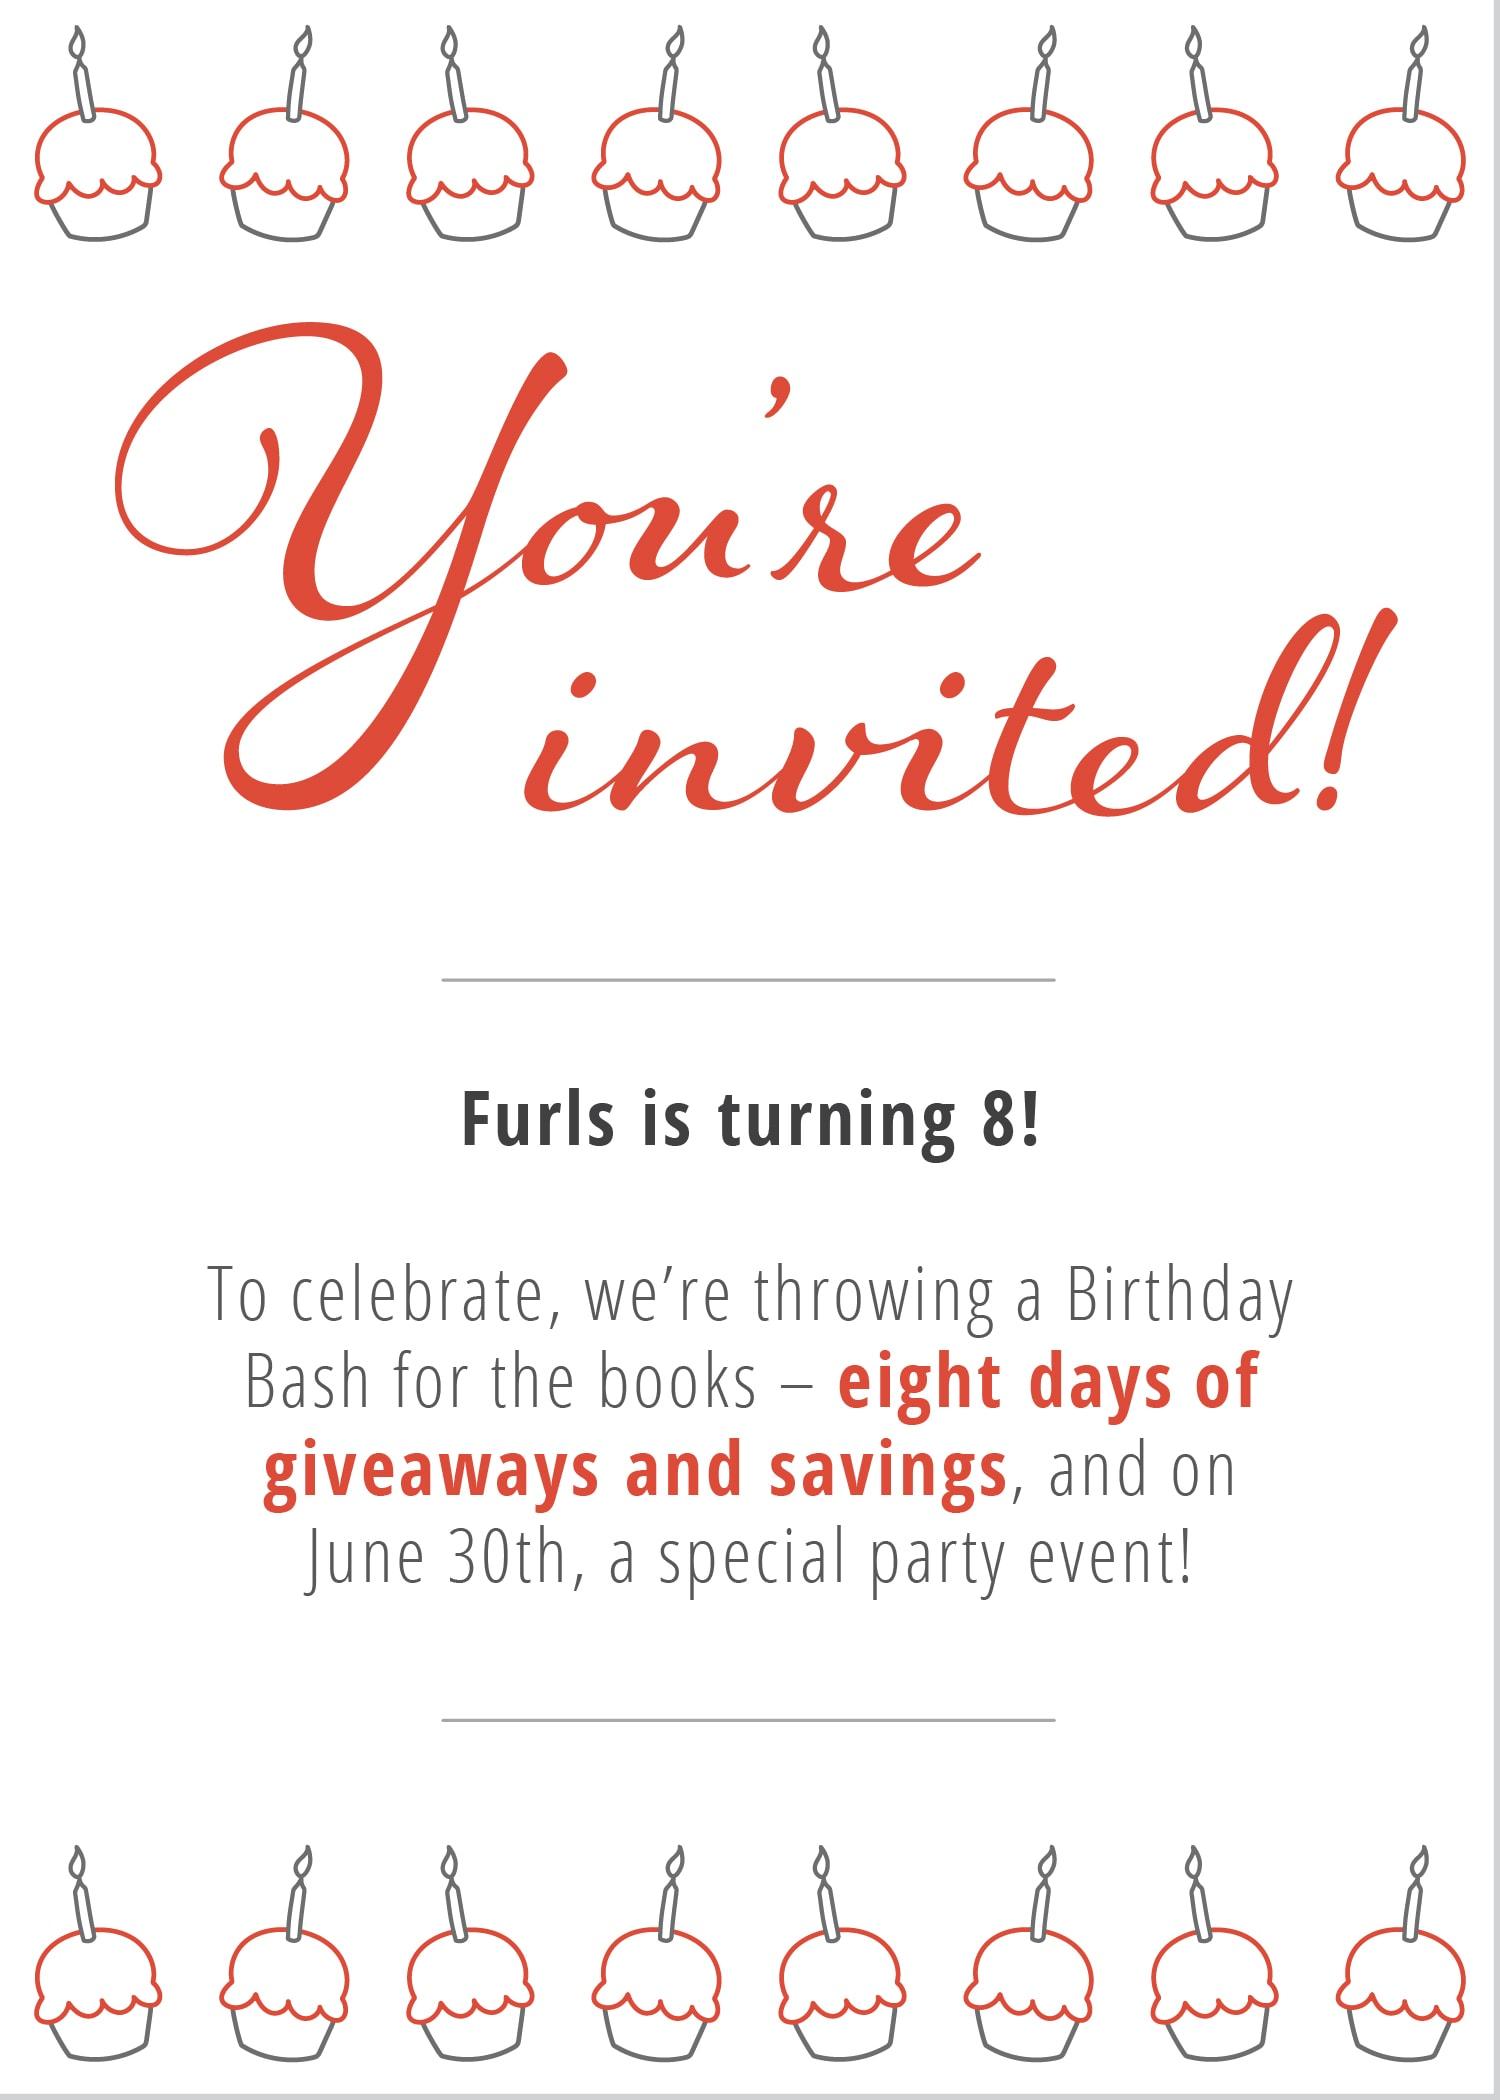 Furls Birthday Bash!